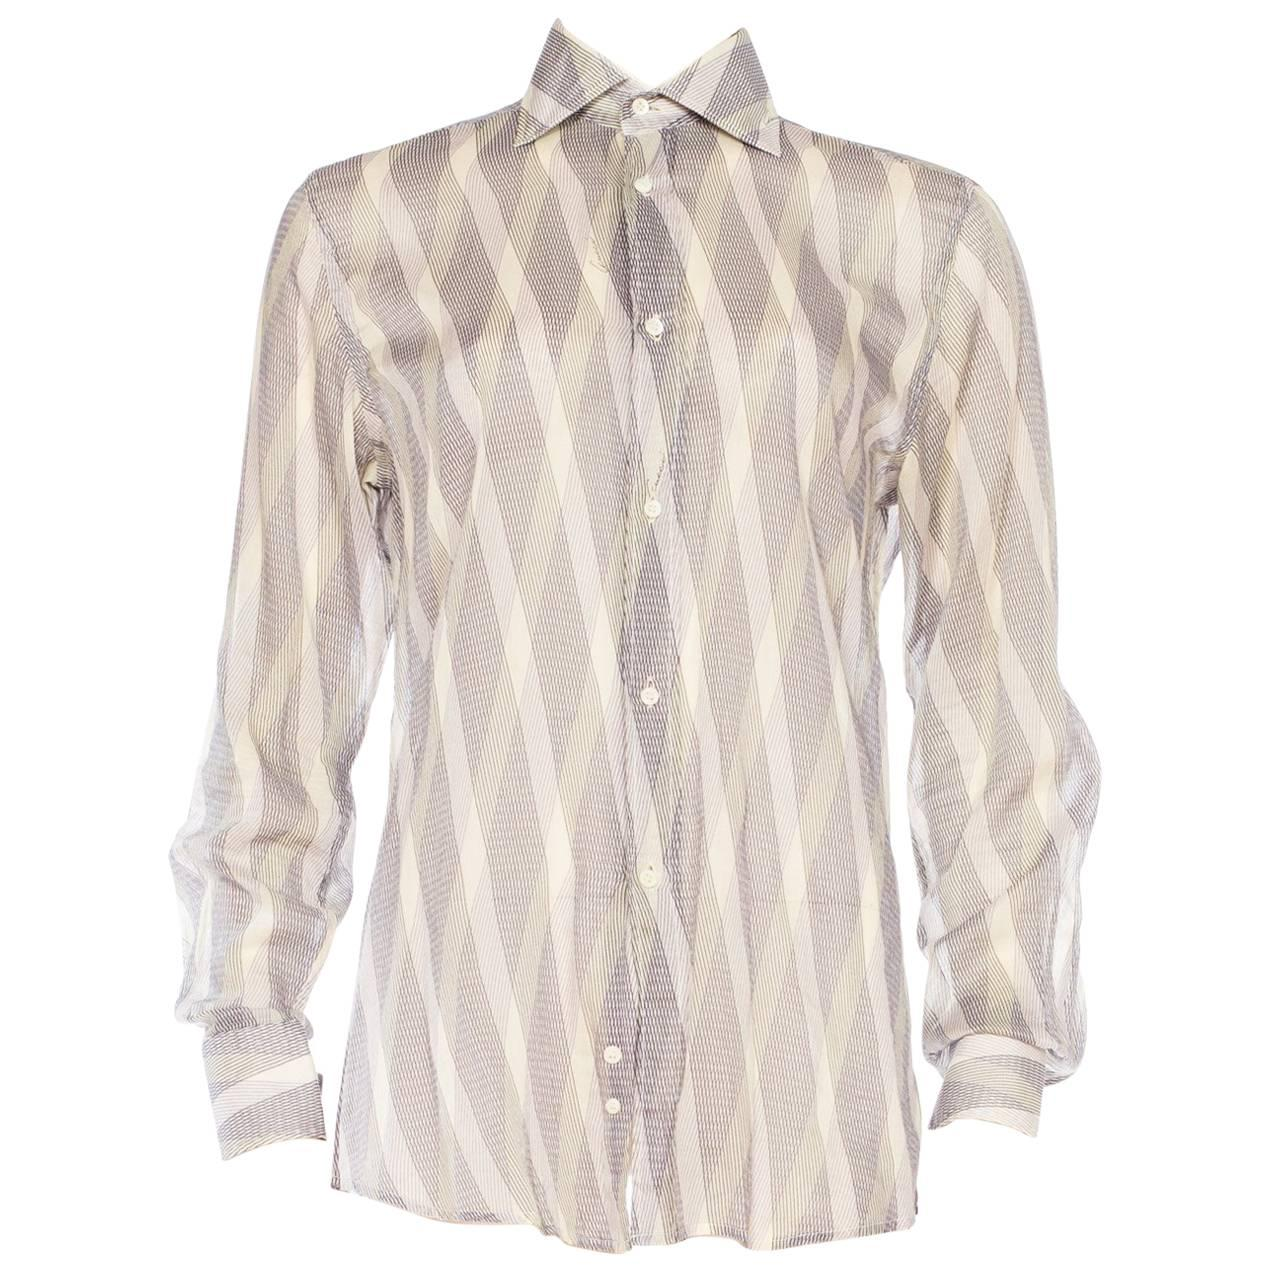 1990S GUCCI Men's 70S Style Sheer Diagonal Striped Shirt